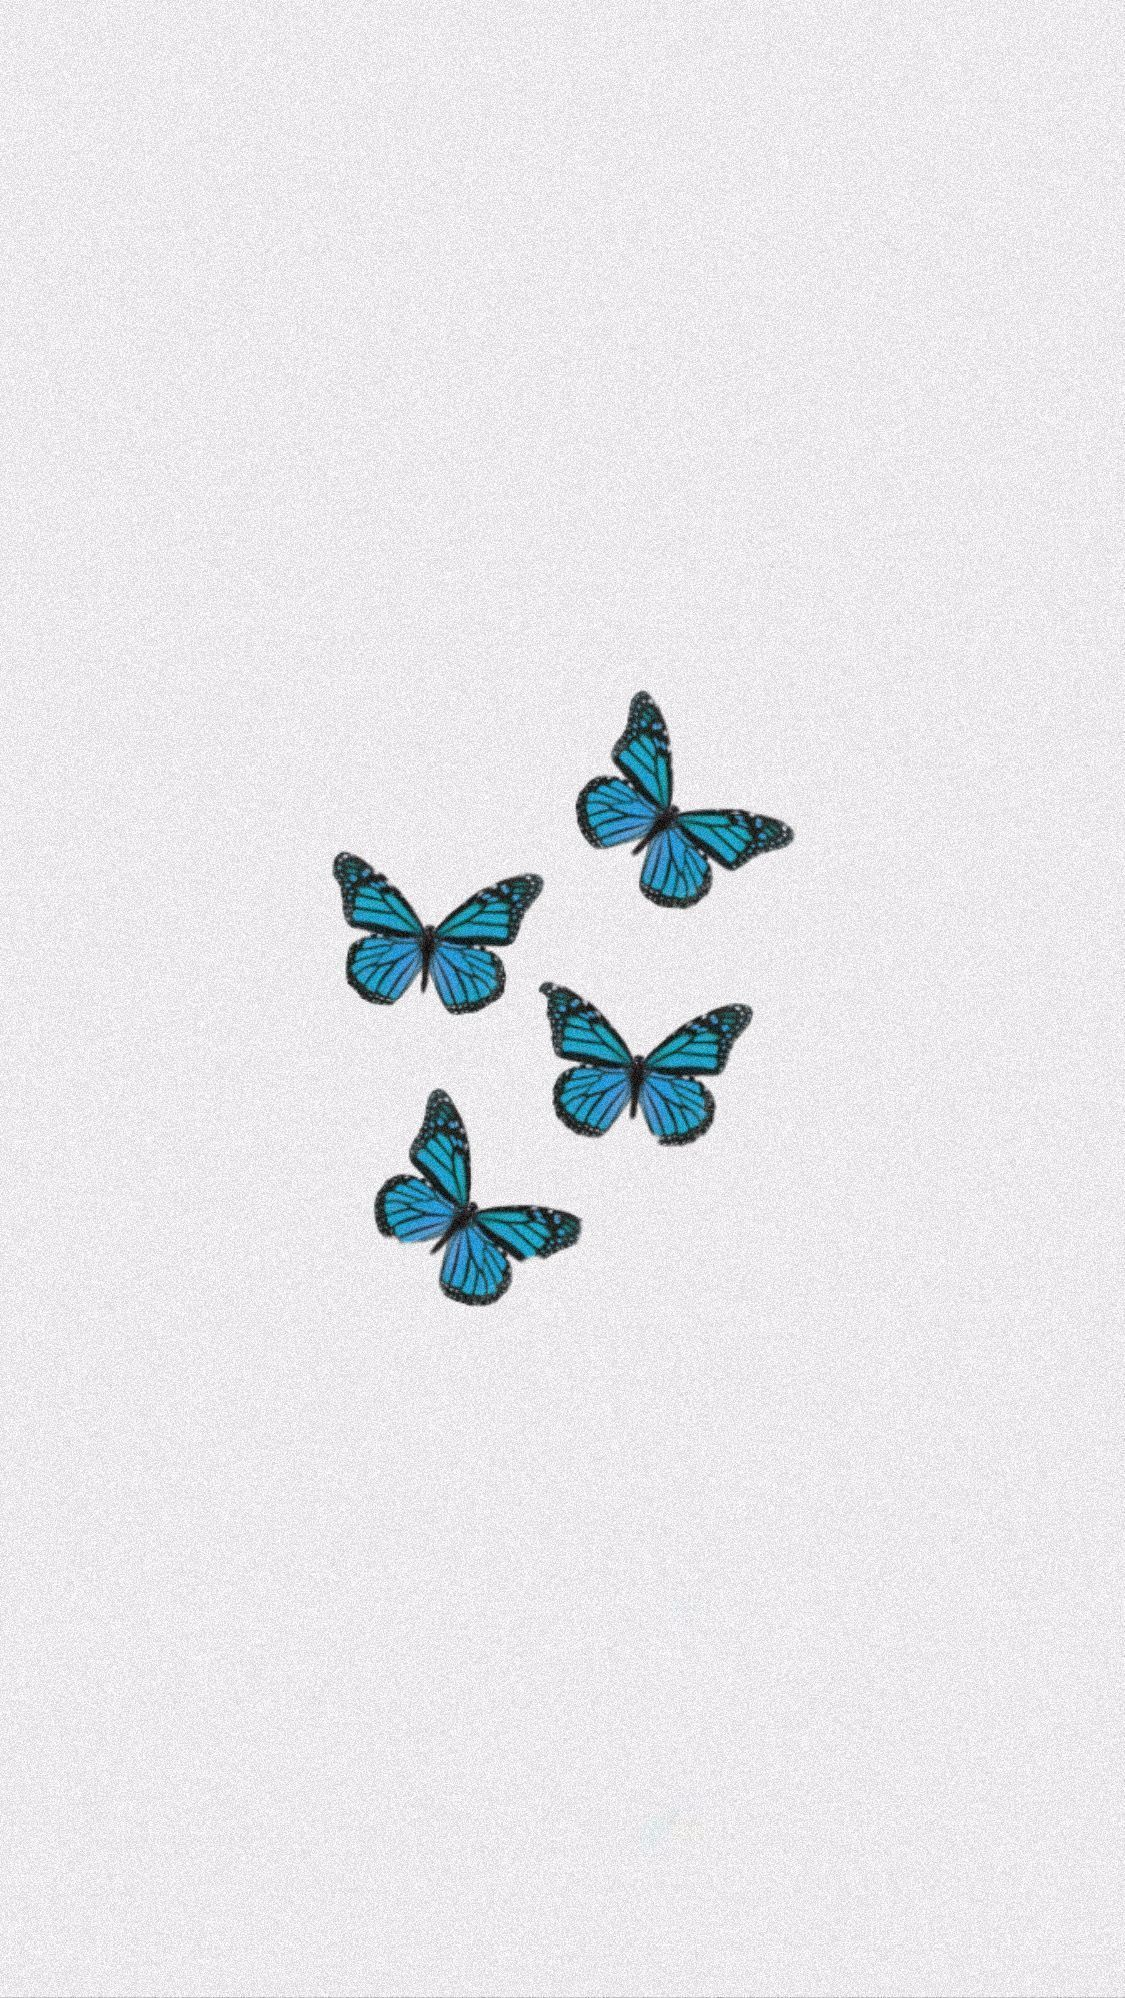 Iphone Wallpaper Pattern Hintergrundbildiphone Tapete Schmetterling Hintergru Flow Iphone Wallpaper Pattern Iphone Wallpaper Vsco Butterfly Wallpaper Iphone